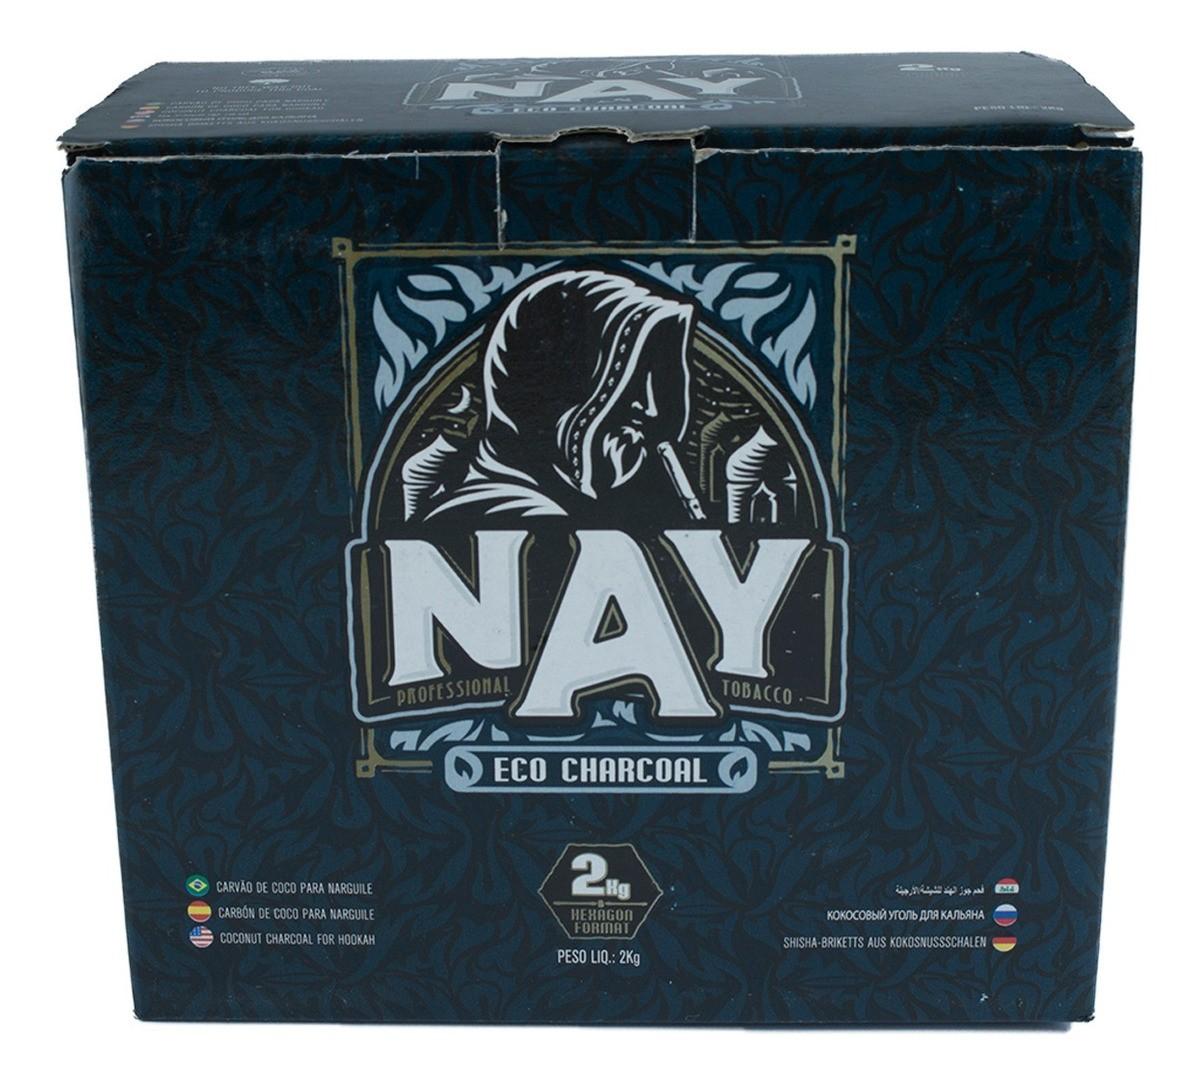 Carvão Coco - Nay 2kg